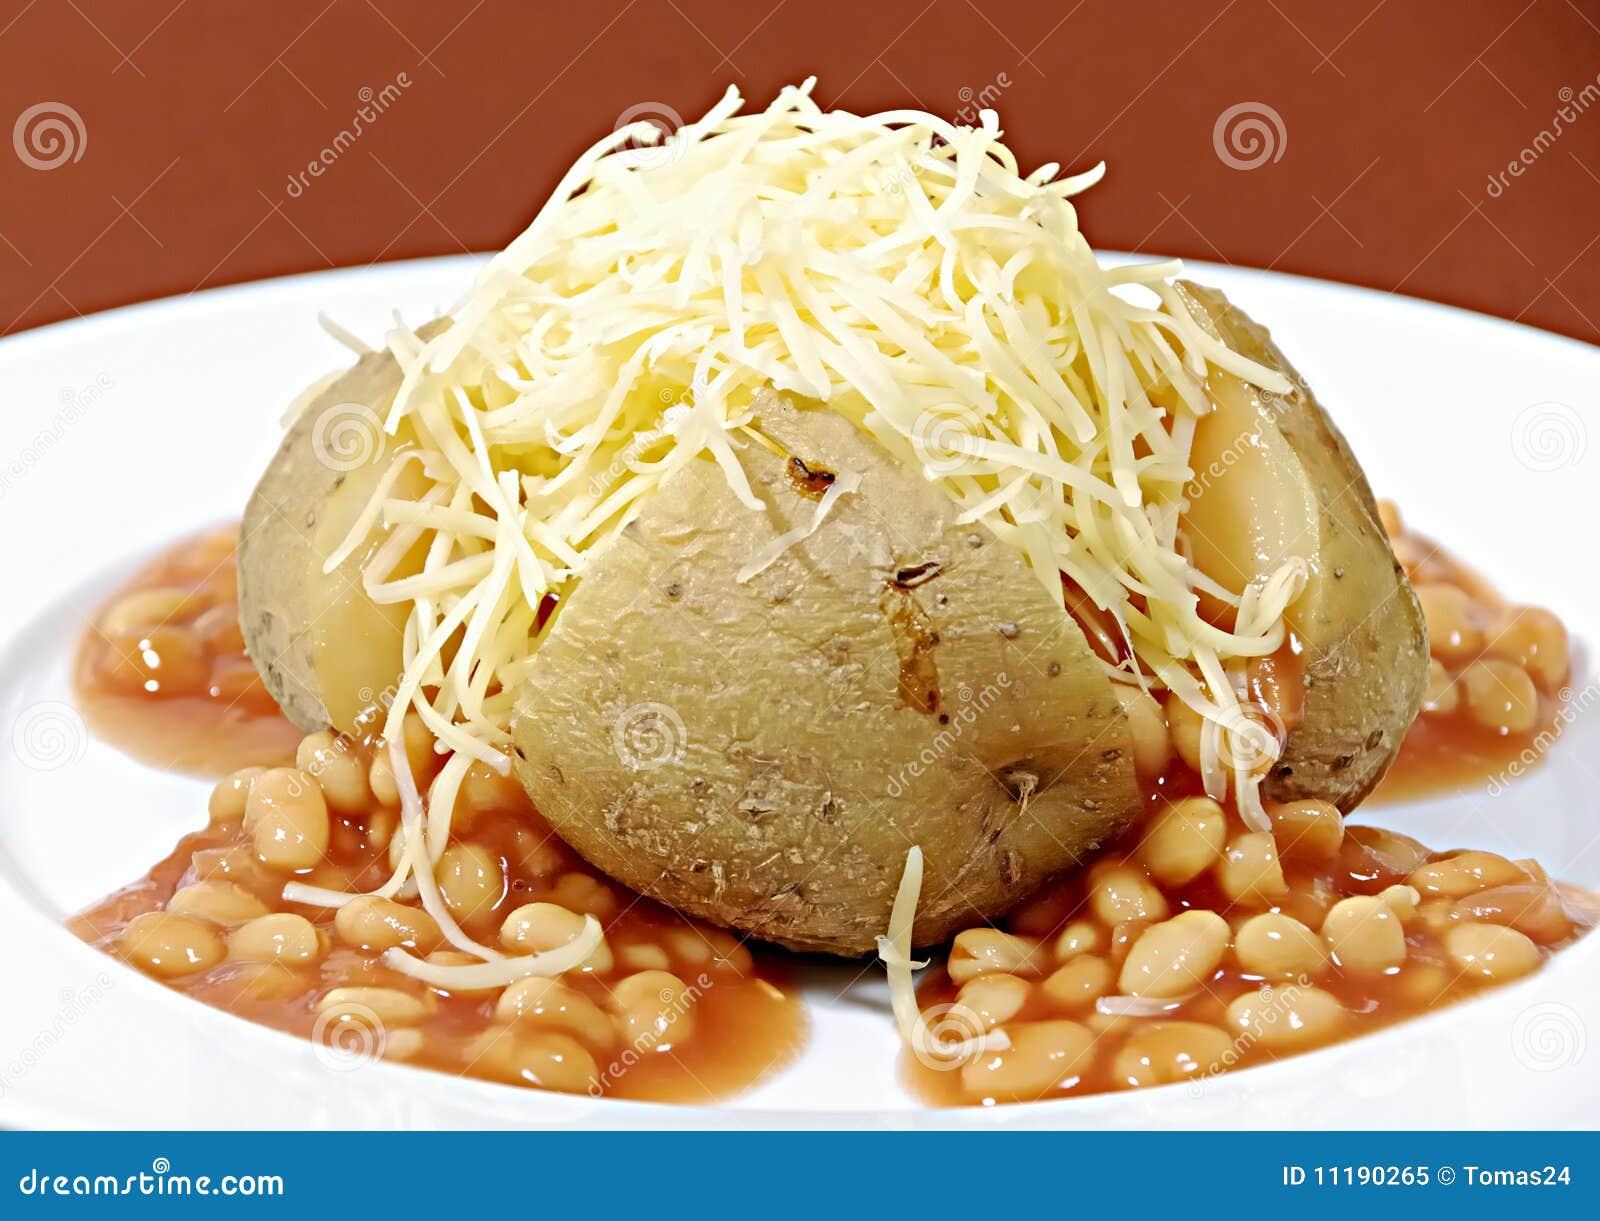 Jacket Potato Royalty Free Stock Photo - Image: 11190265